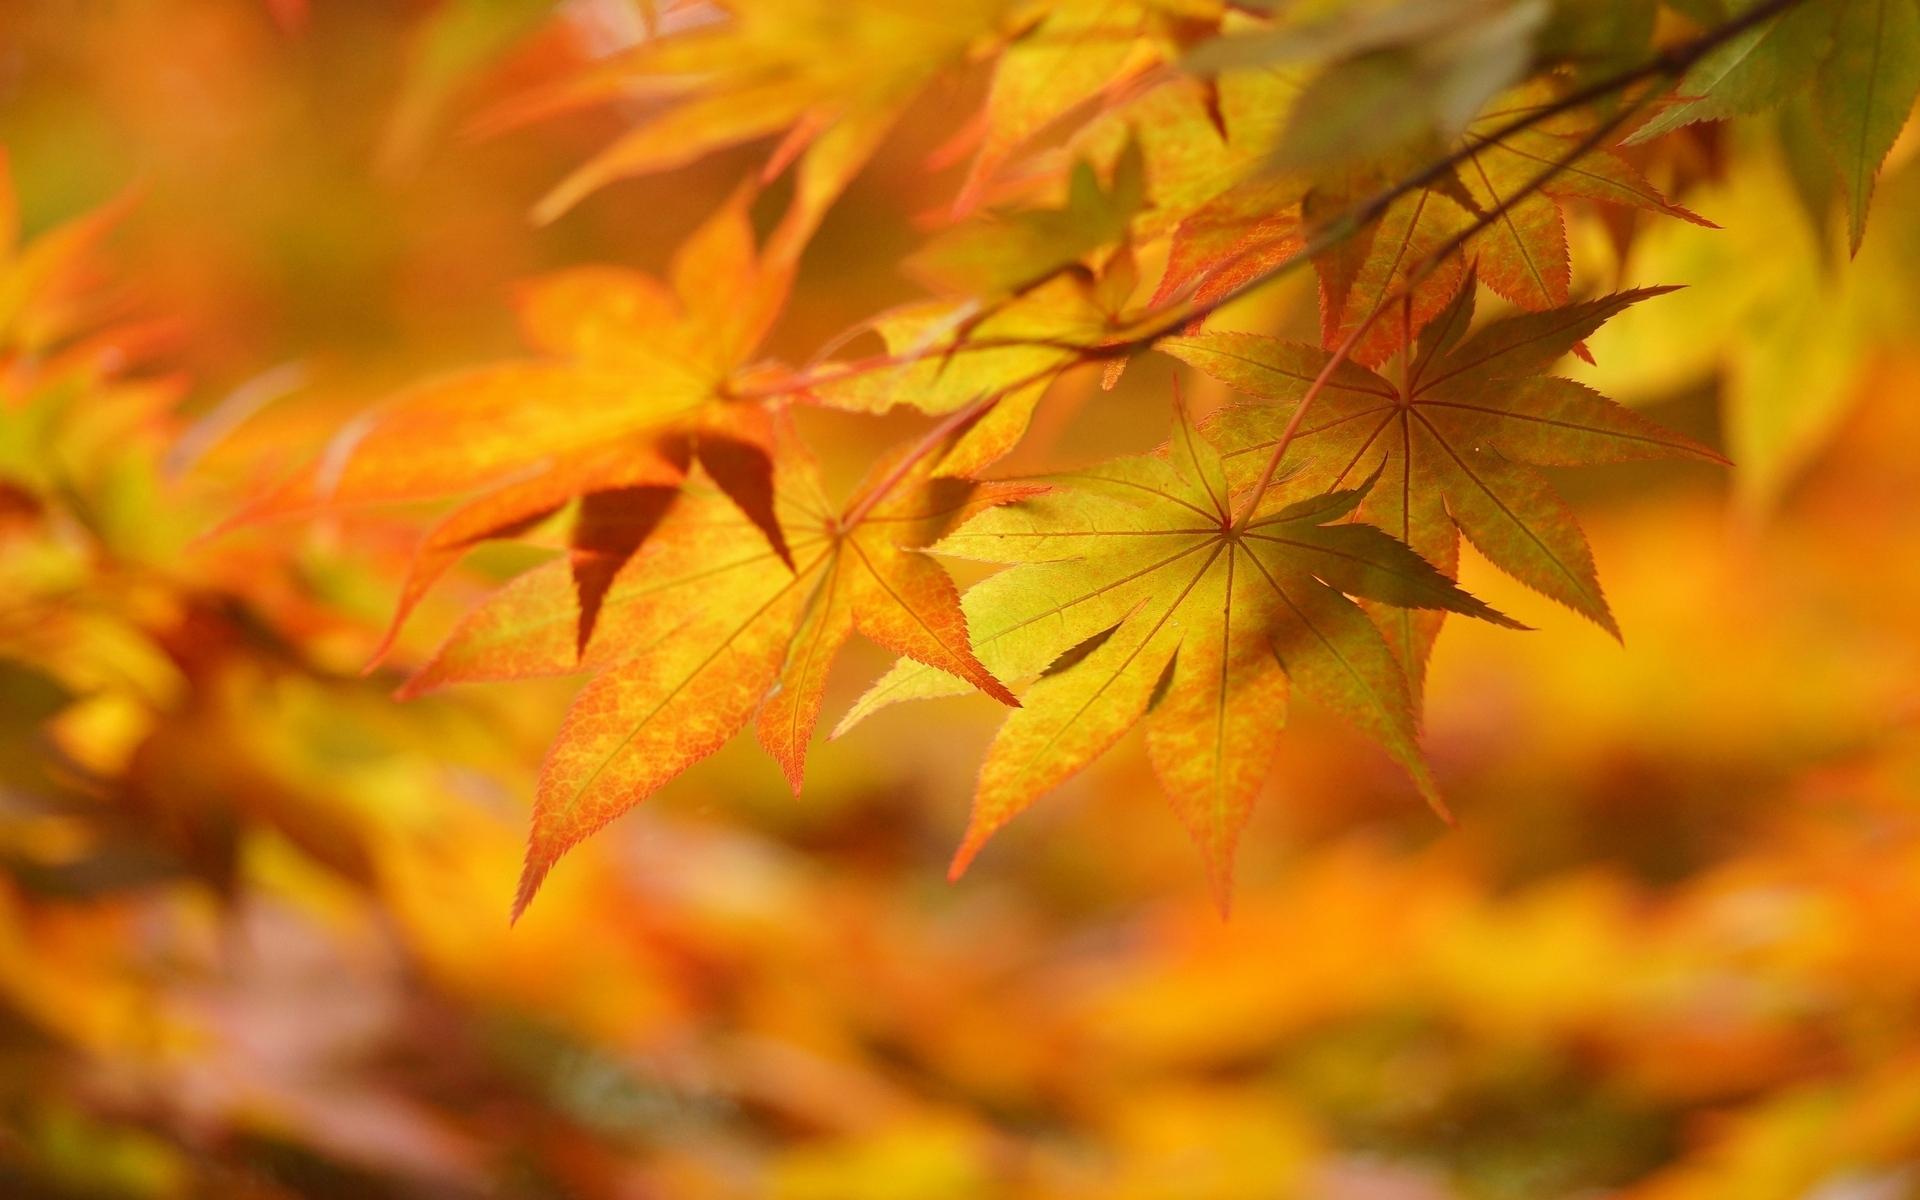 Autumn Leaves 3d Live Wallpaper Autumn Leaves Hd Hd Desktop Wallpapers 4k Hd